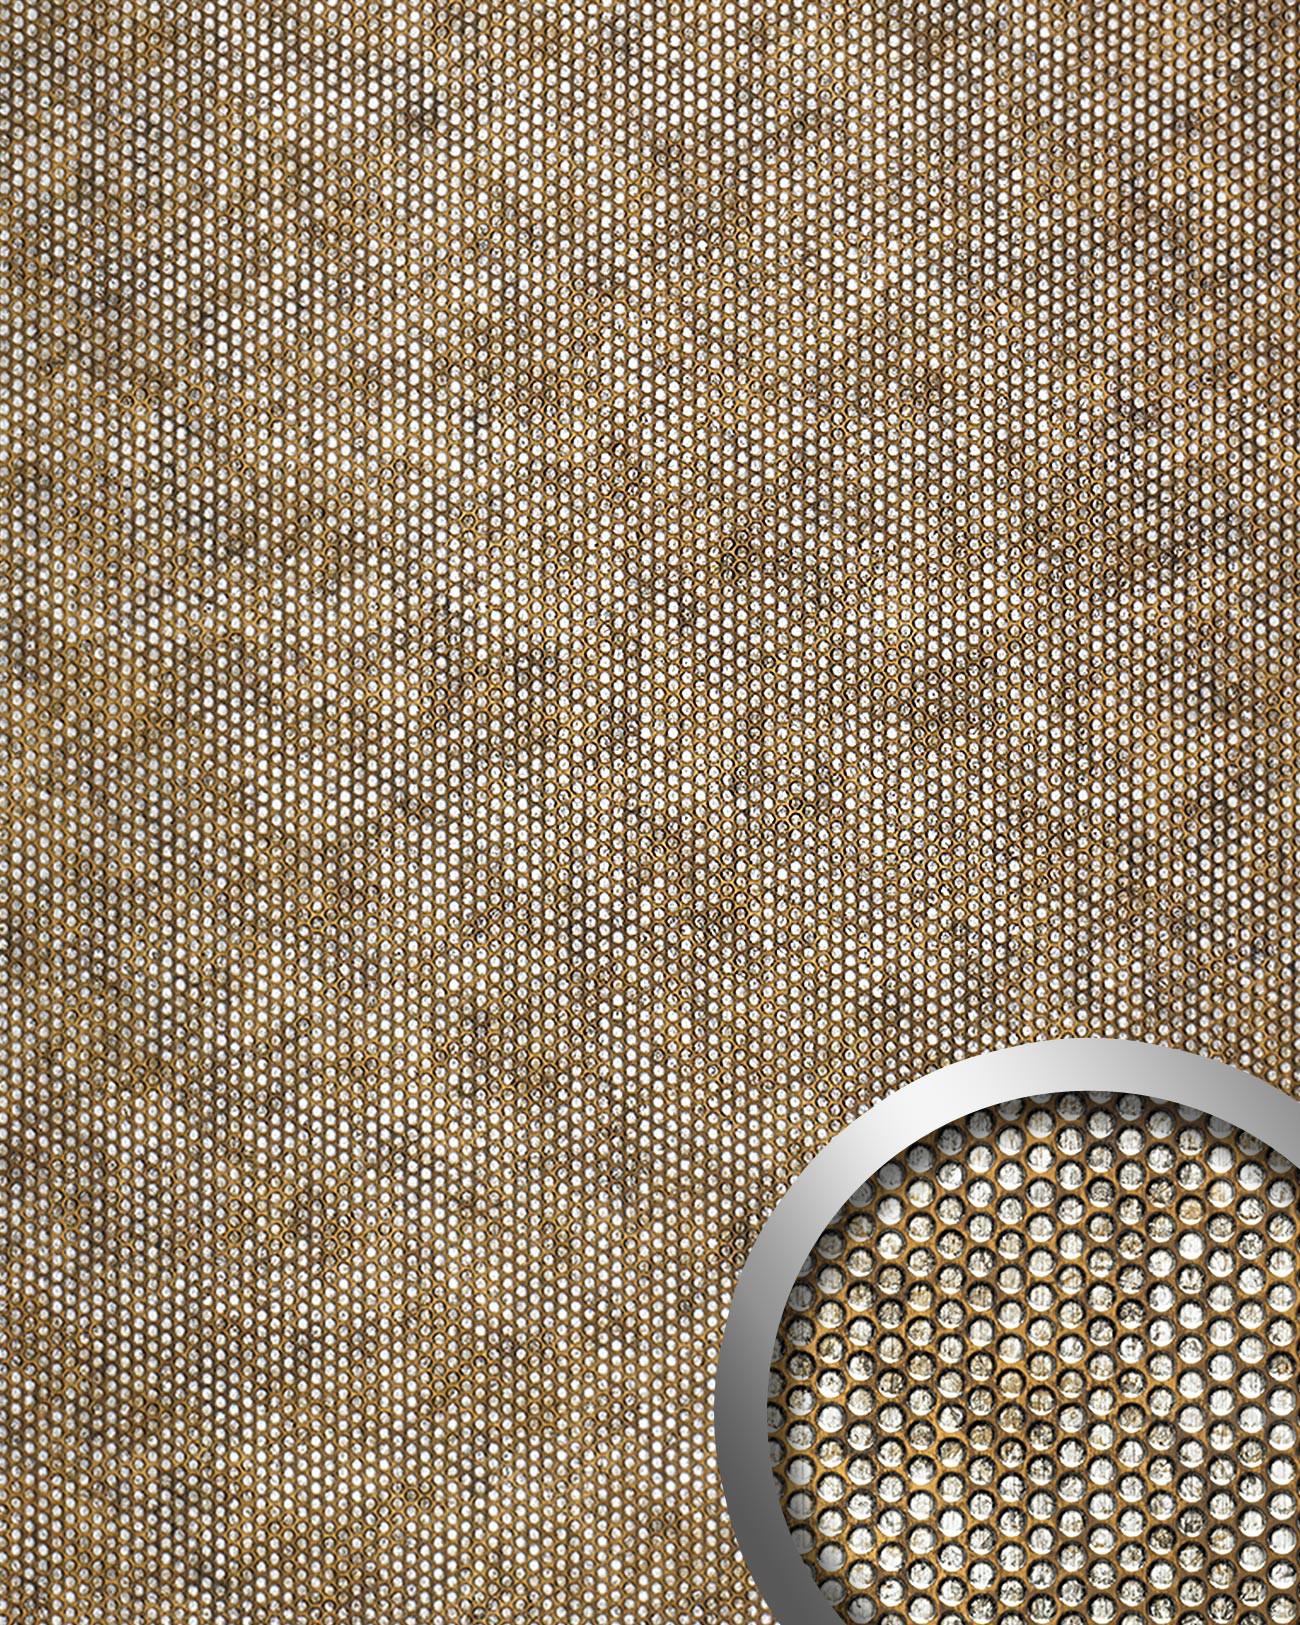 WallFace RACE Wall panel self adhesive 3D embossed brown